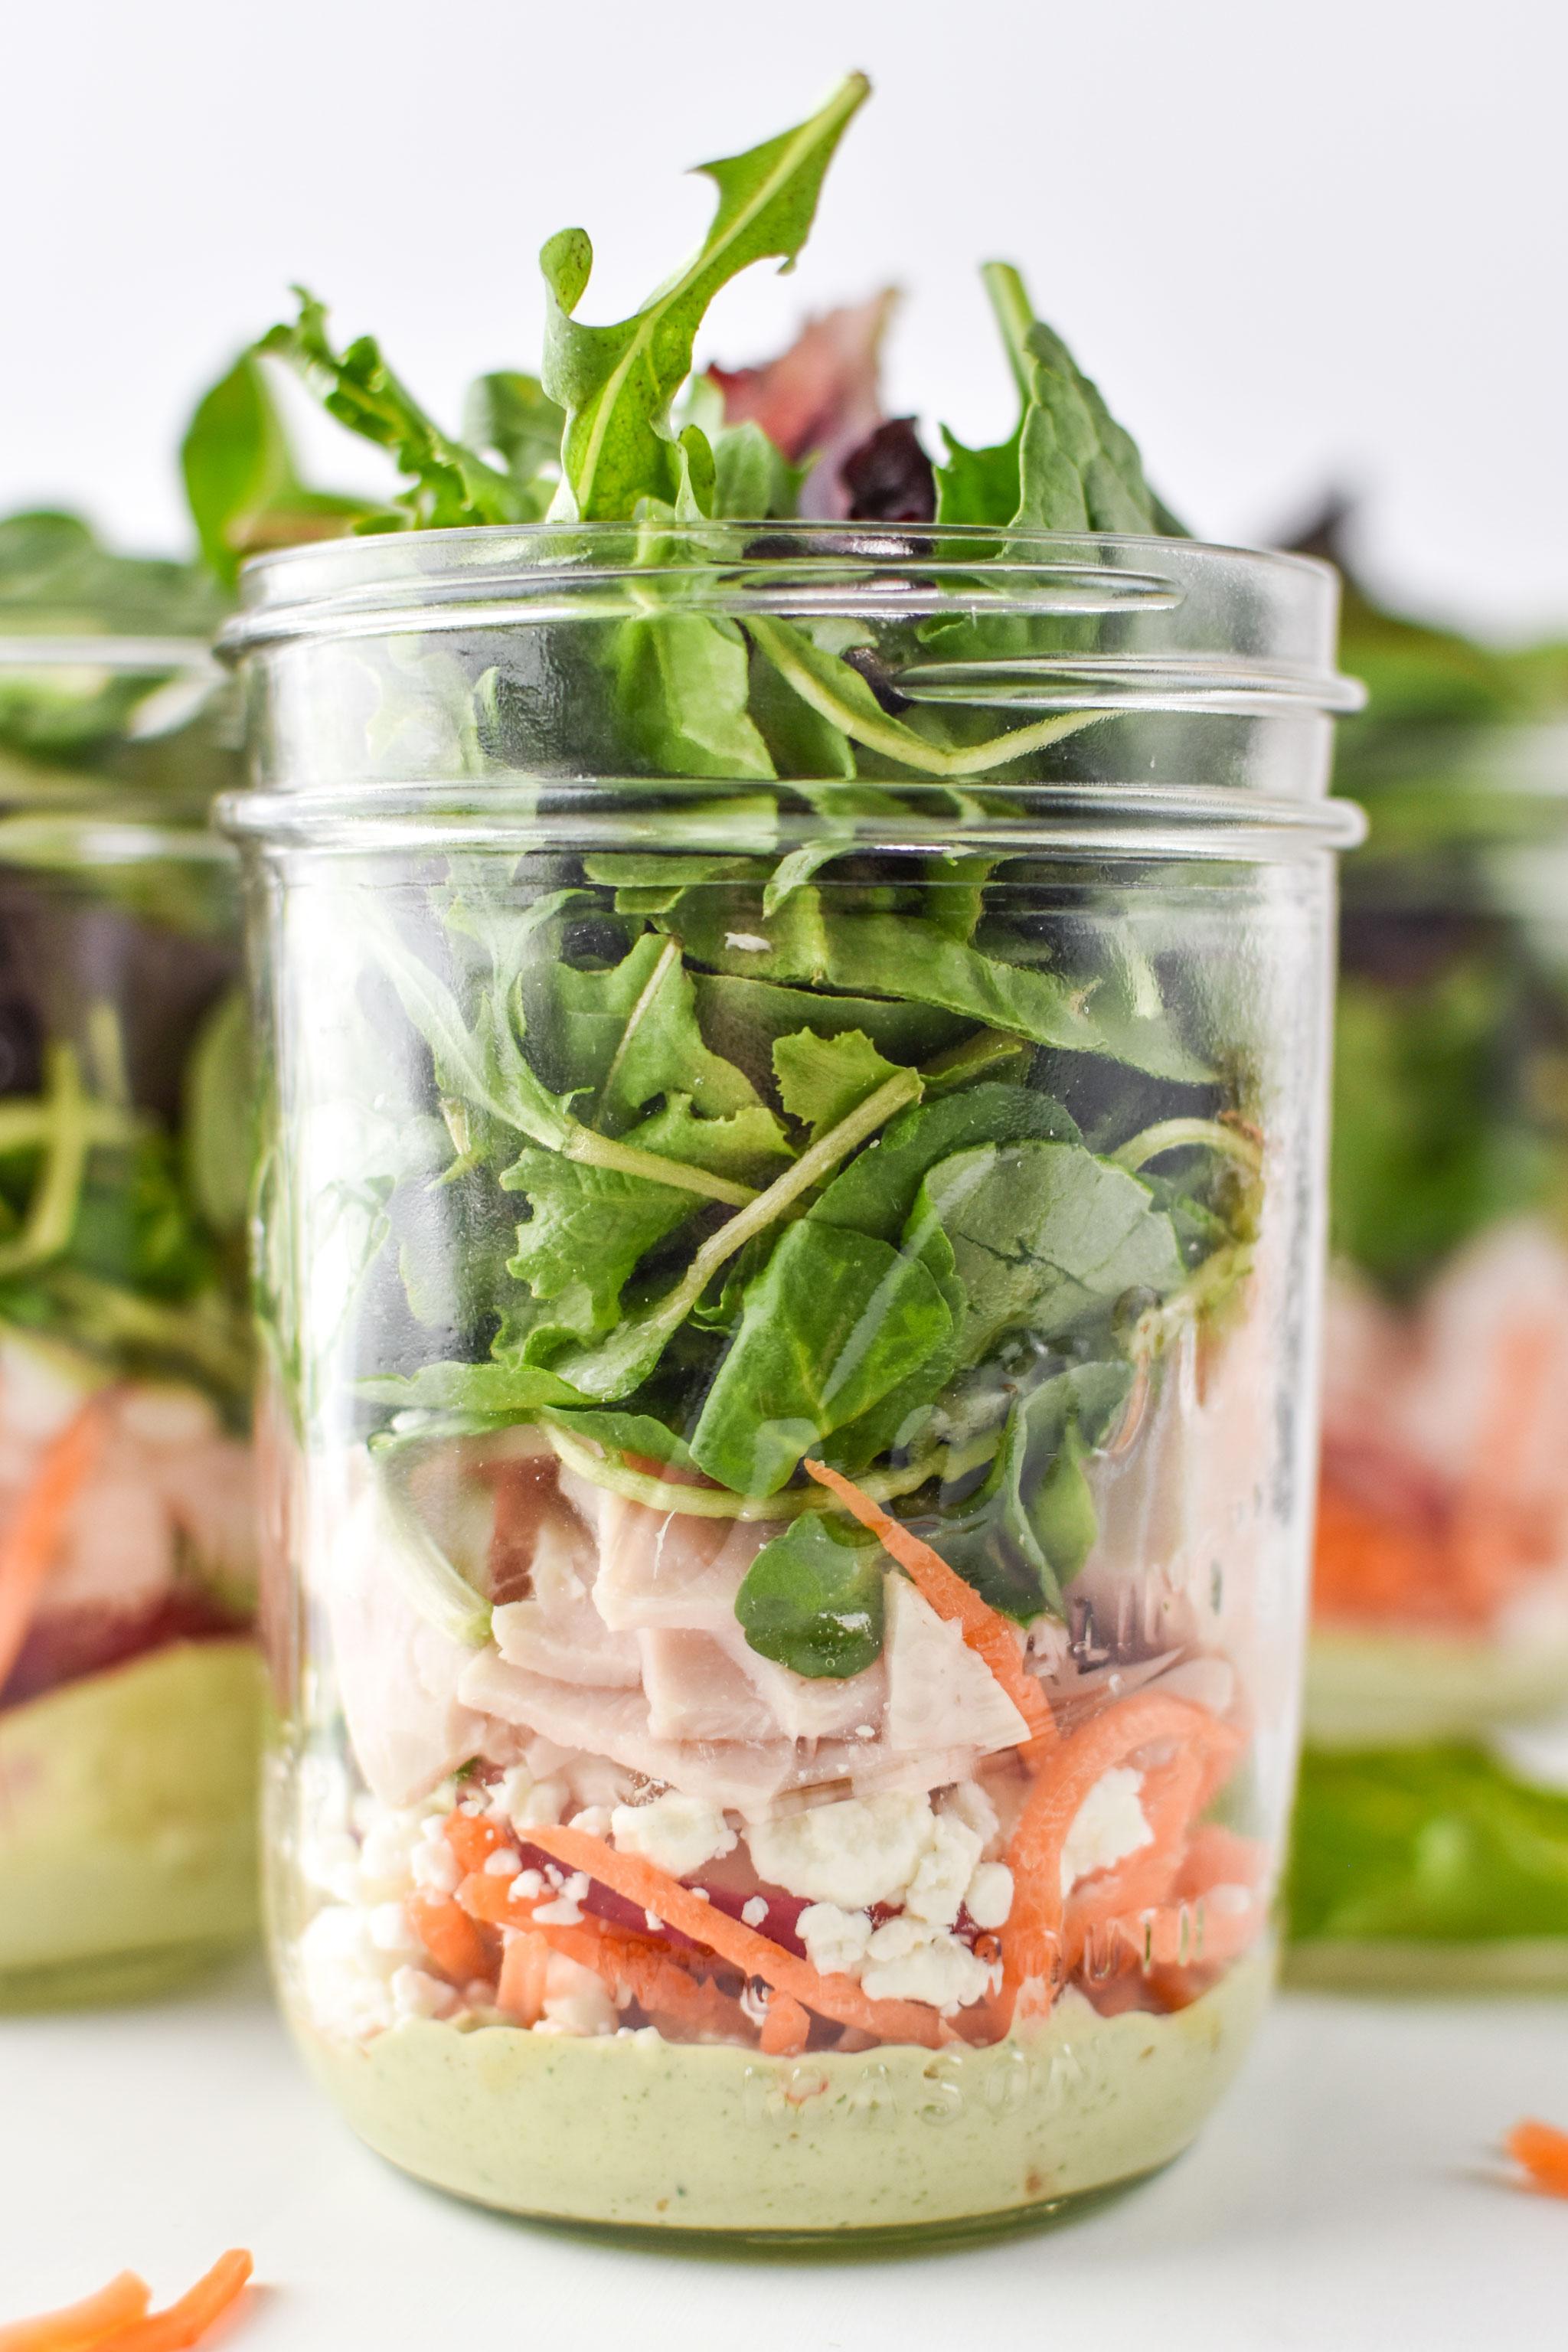 Cilantro lime tahini dressing at the bottom of these mason jar salads